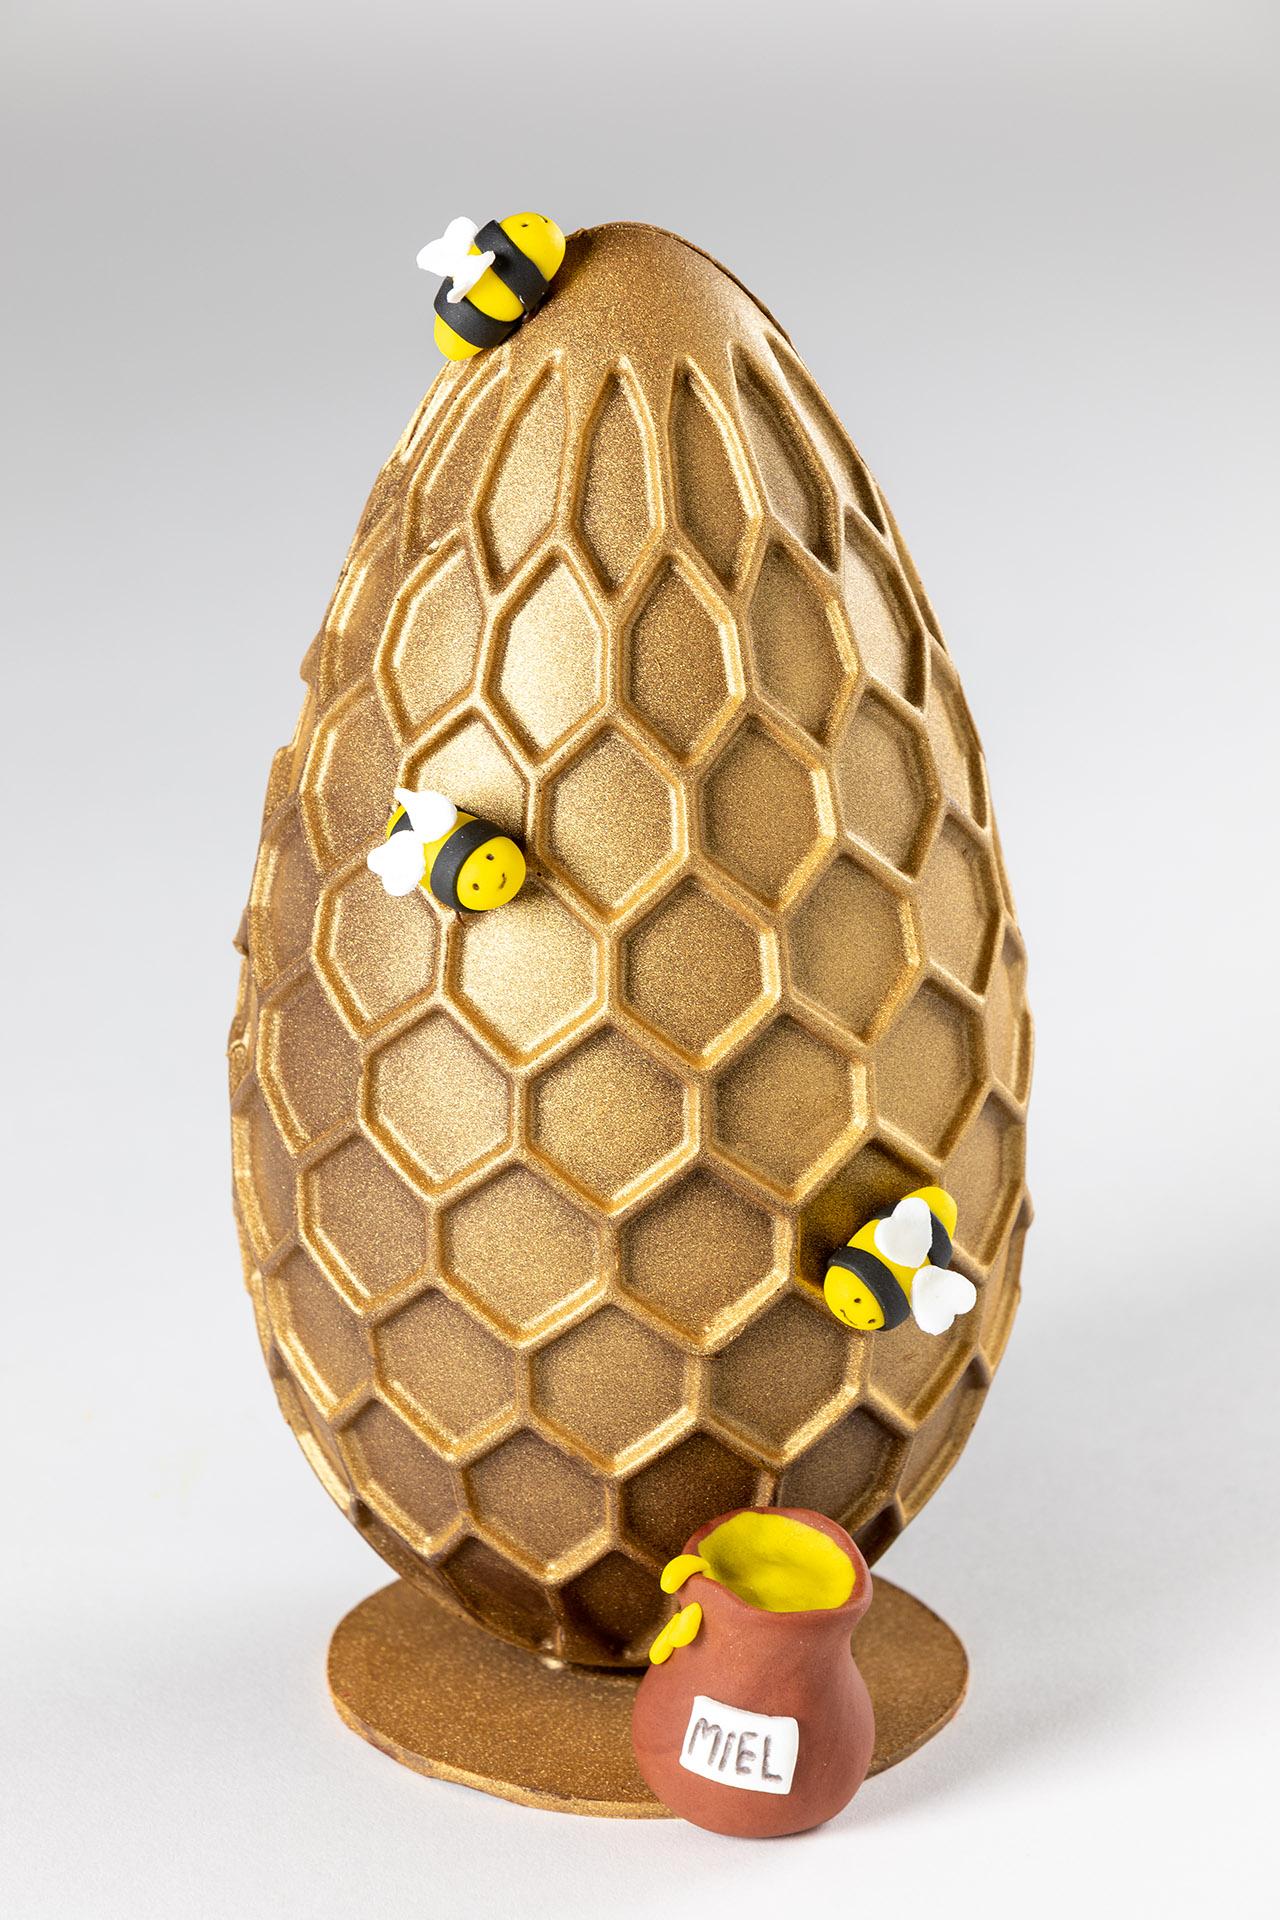 huevo de pascua panal de chocolate